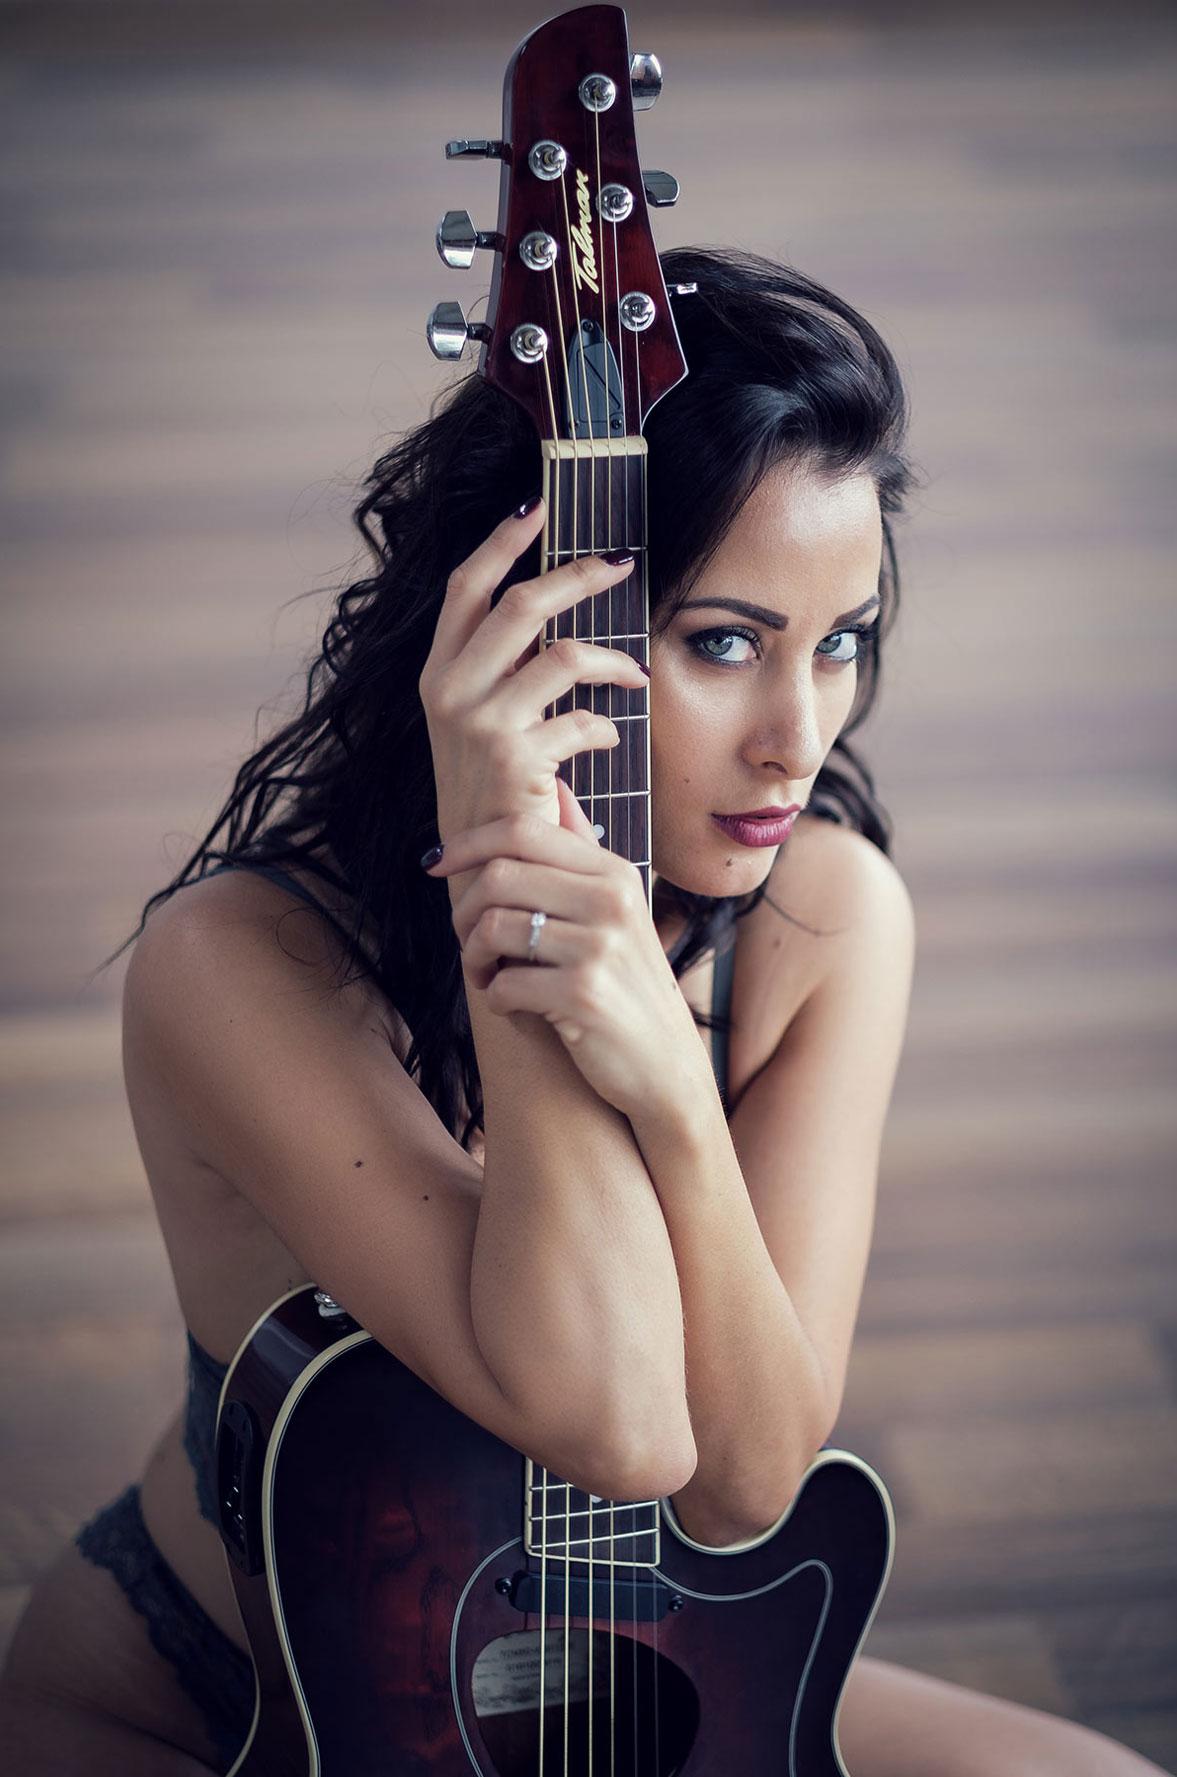 Девушка с гитарой - Селин Руссо / Celine Russo nude by Alexander Glocker